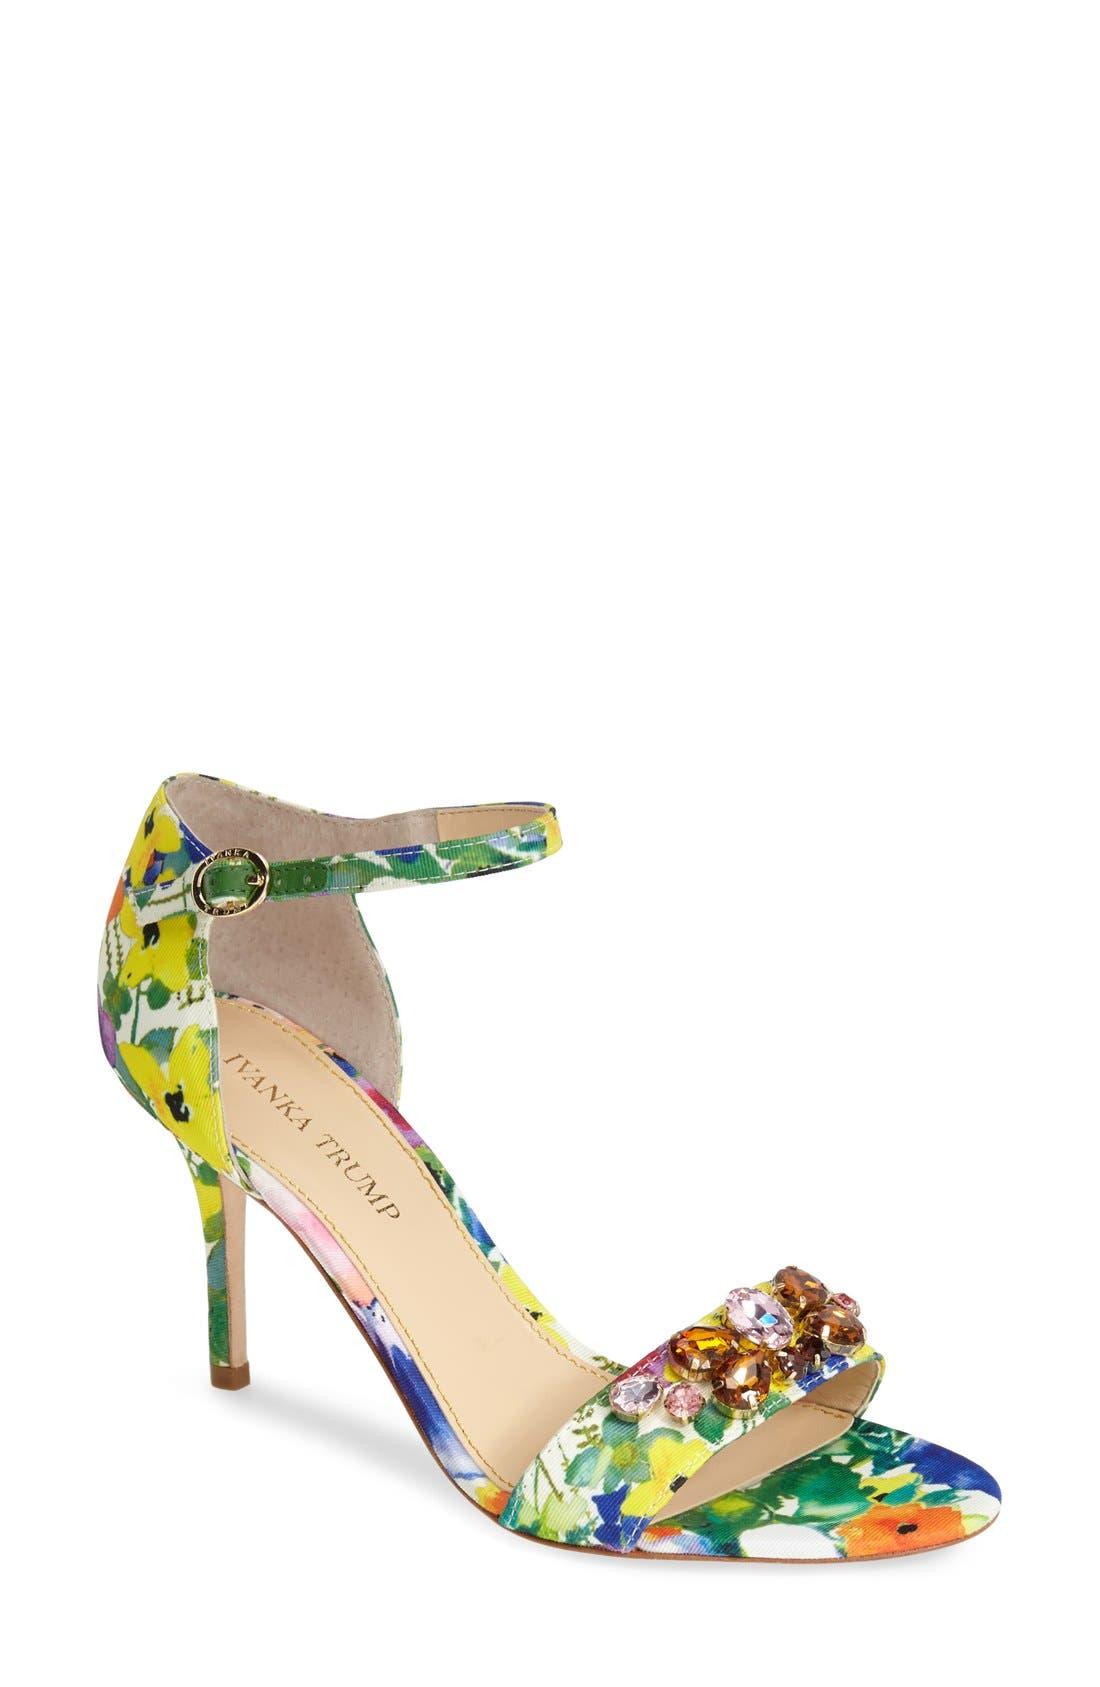 Main Image - Ivanka Trump 'Gessa' Crystal Embellished Print Sandal (Women)